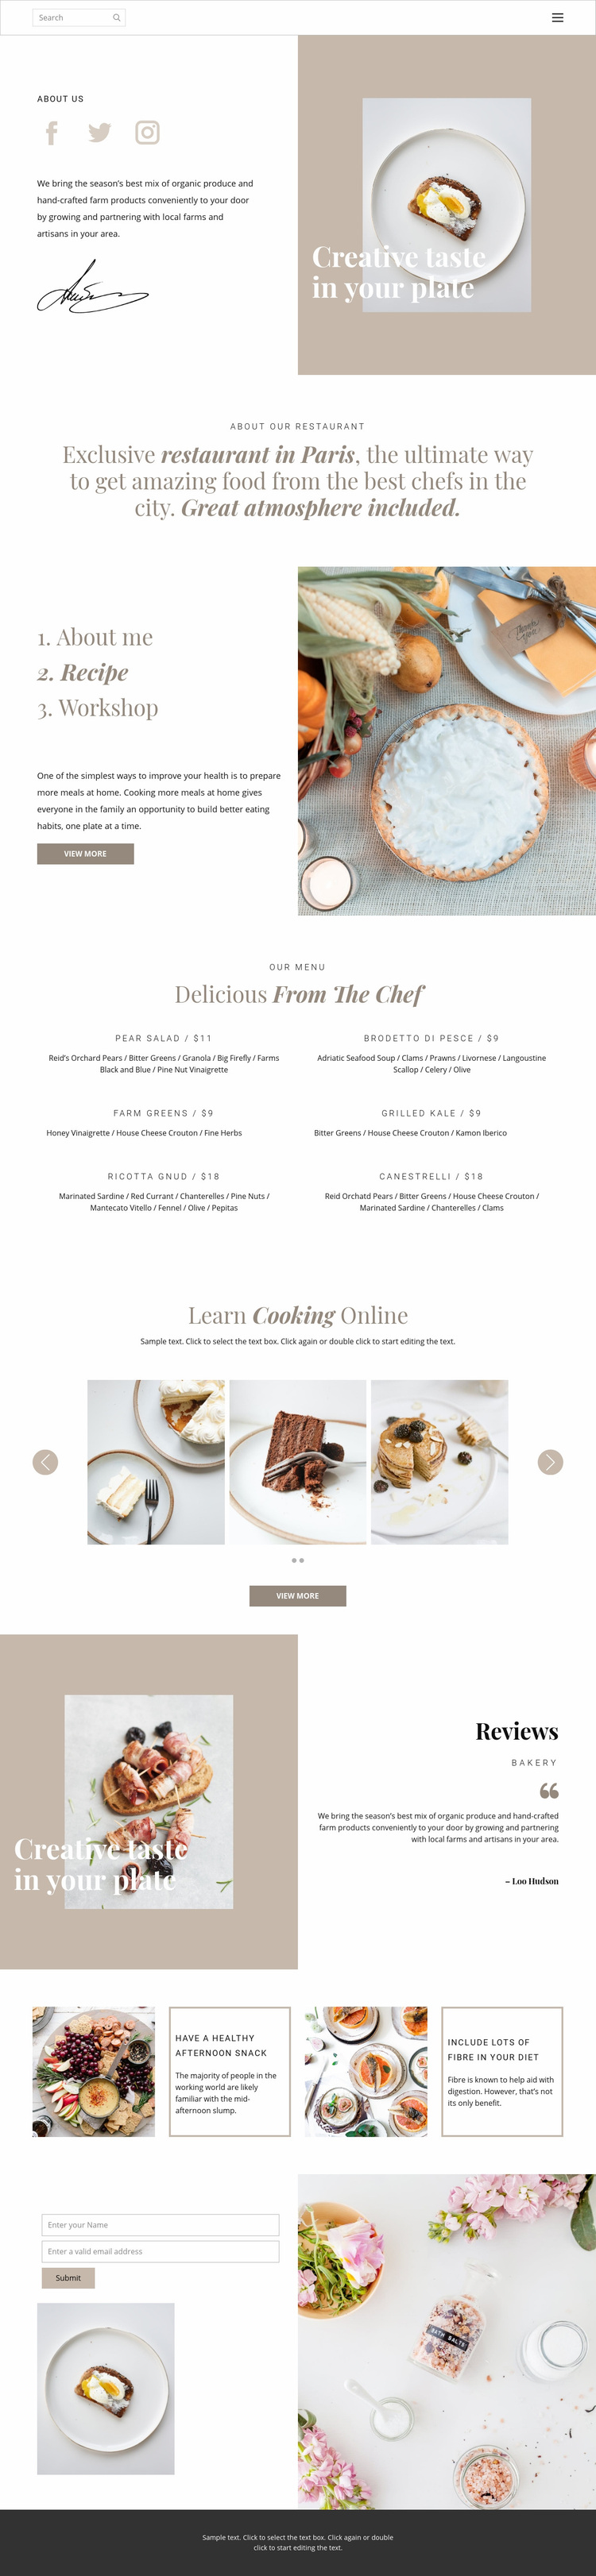 Creative taste in plate Web Page Designer